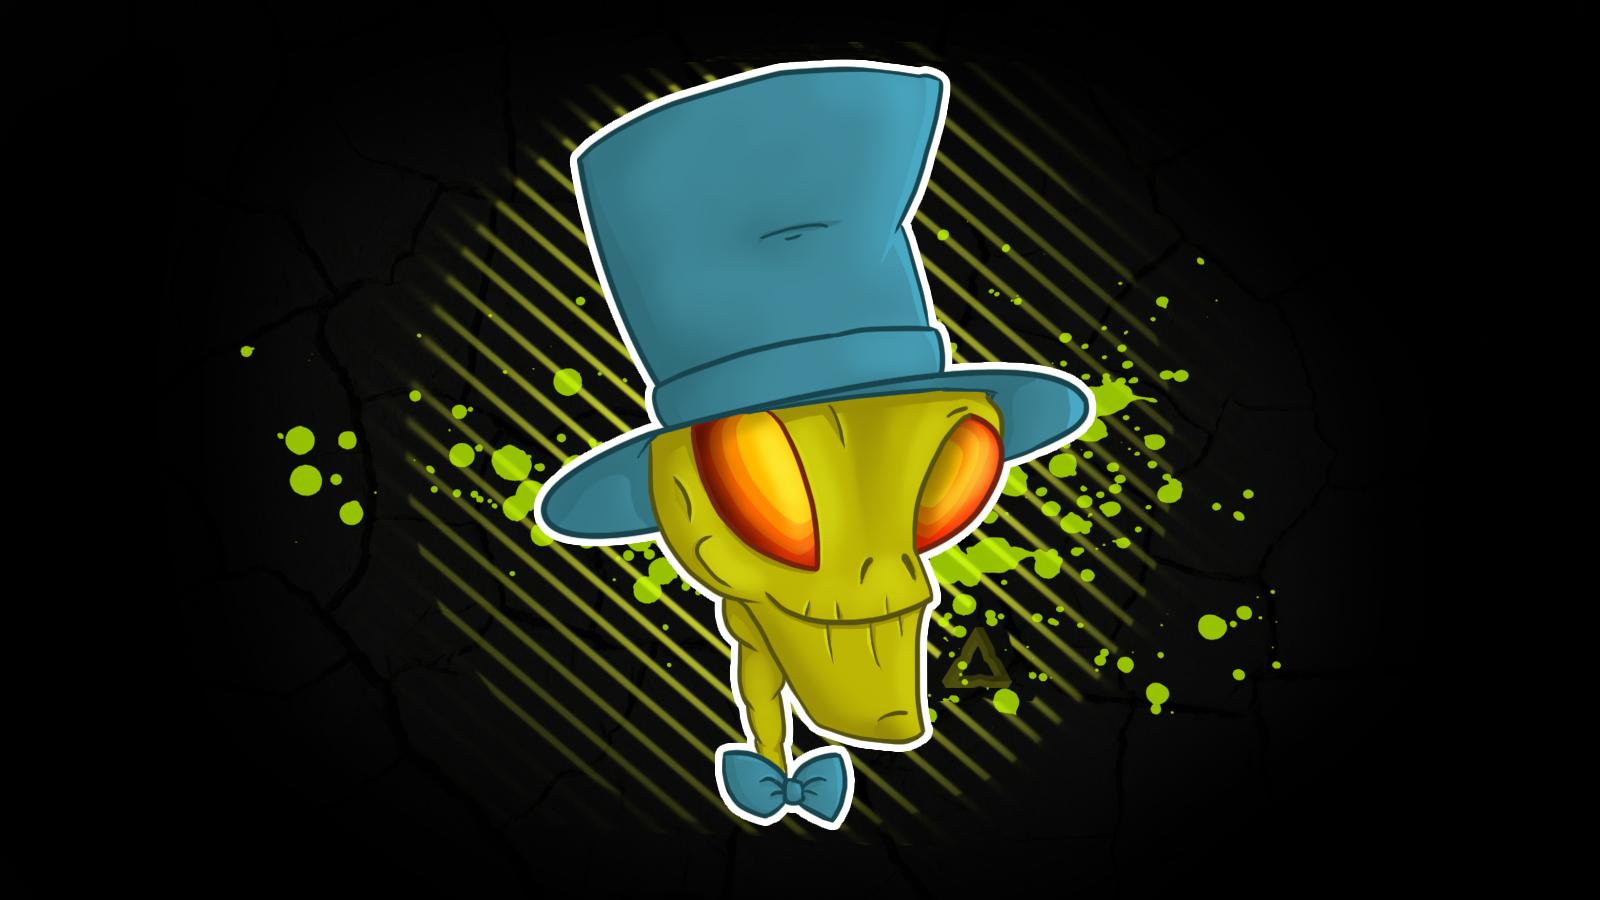 Alien with hat